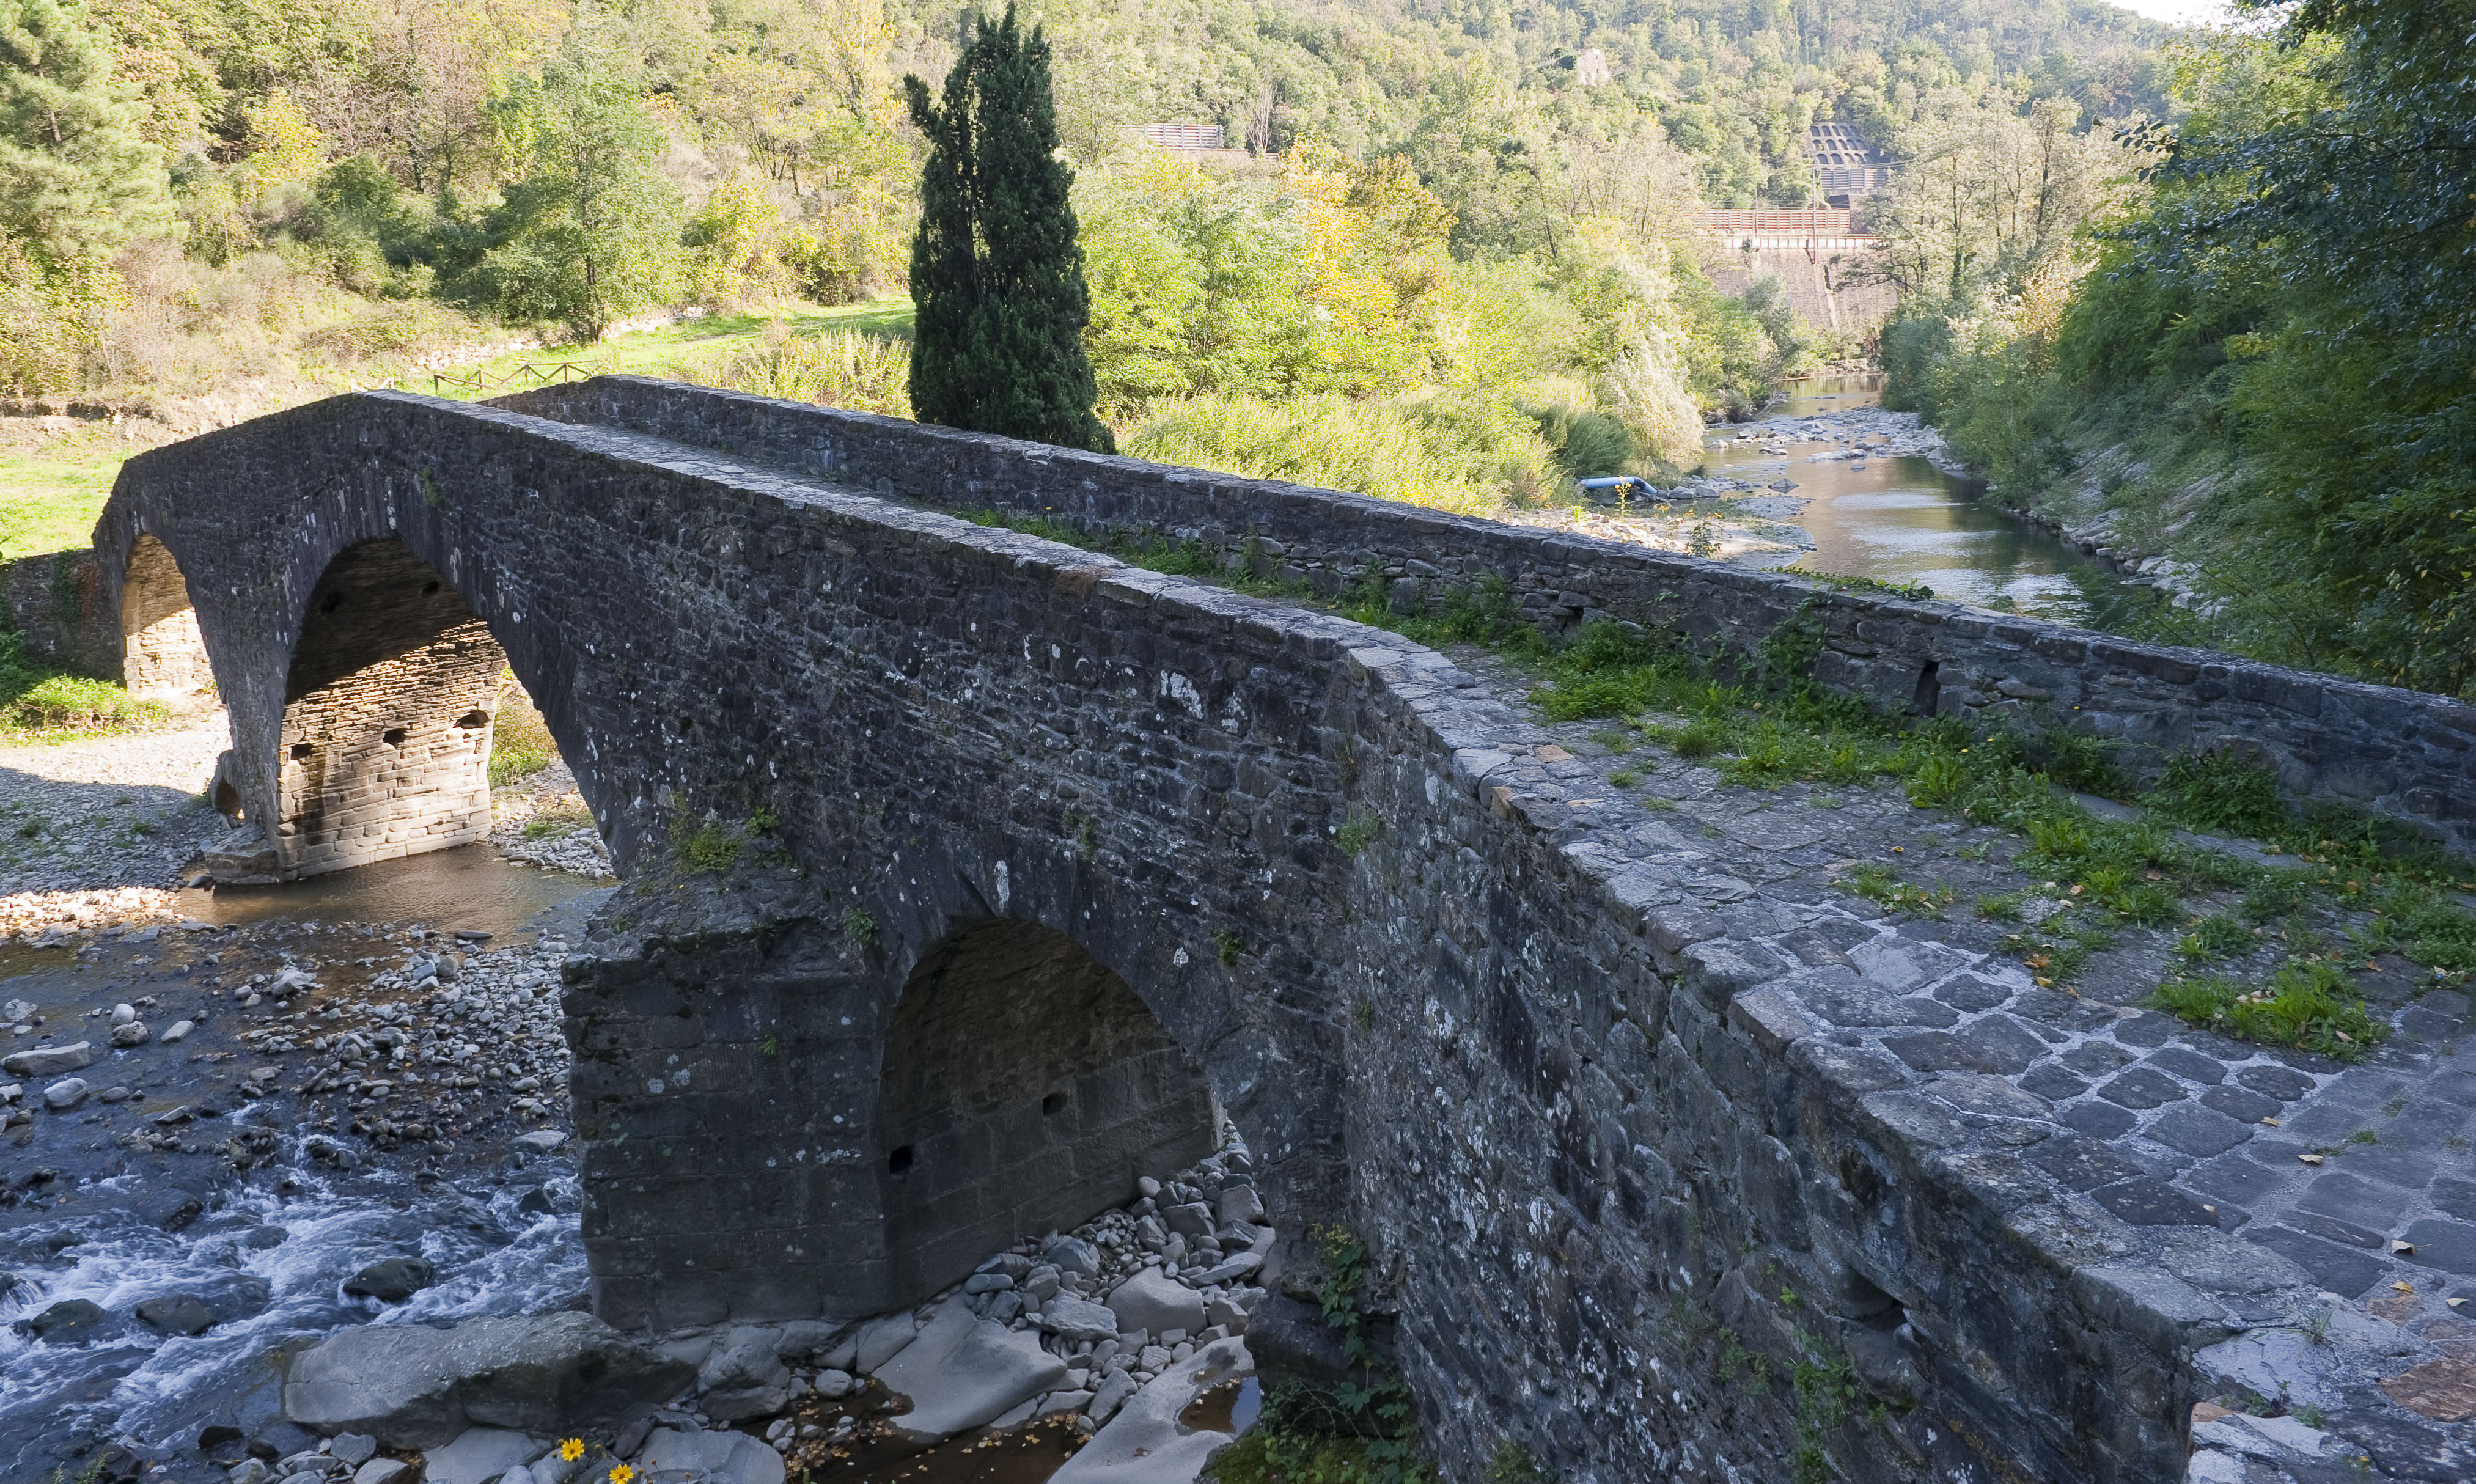 Ponte_di_cerbaia_prato.jpg